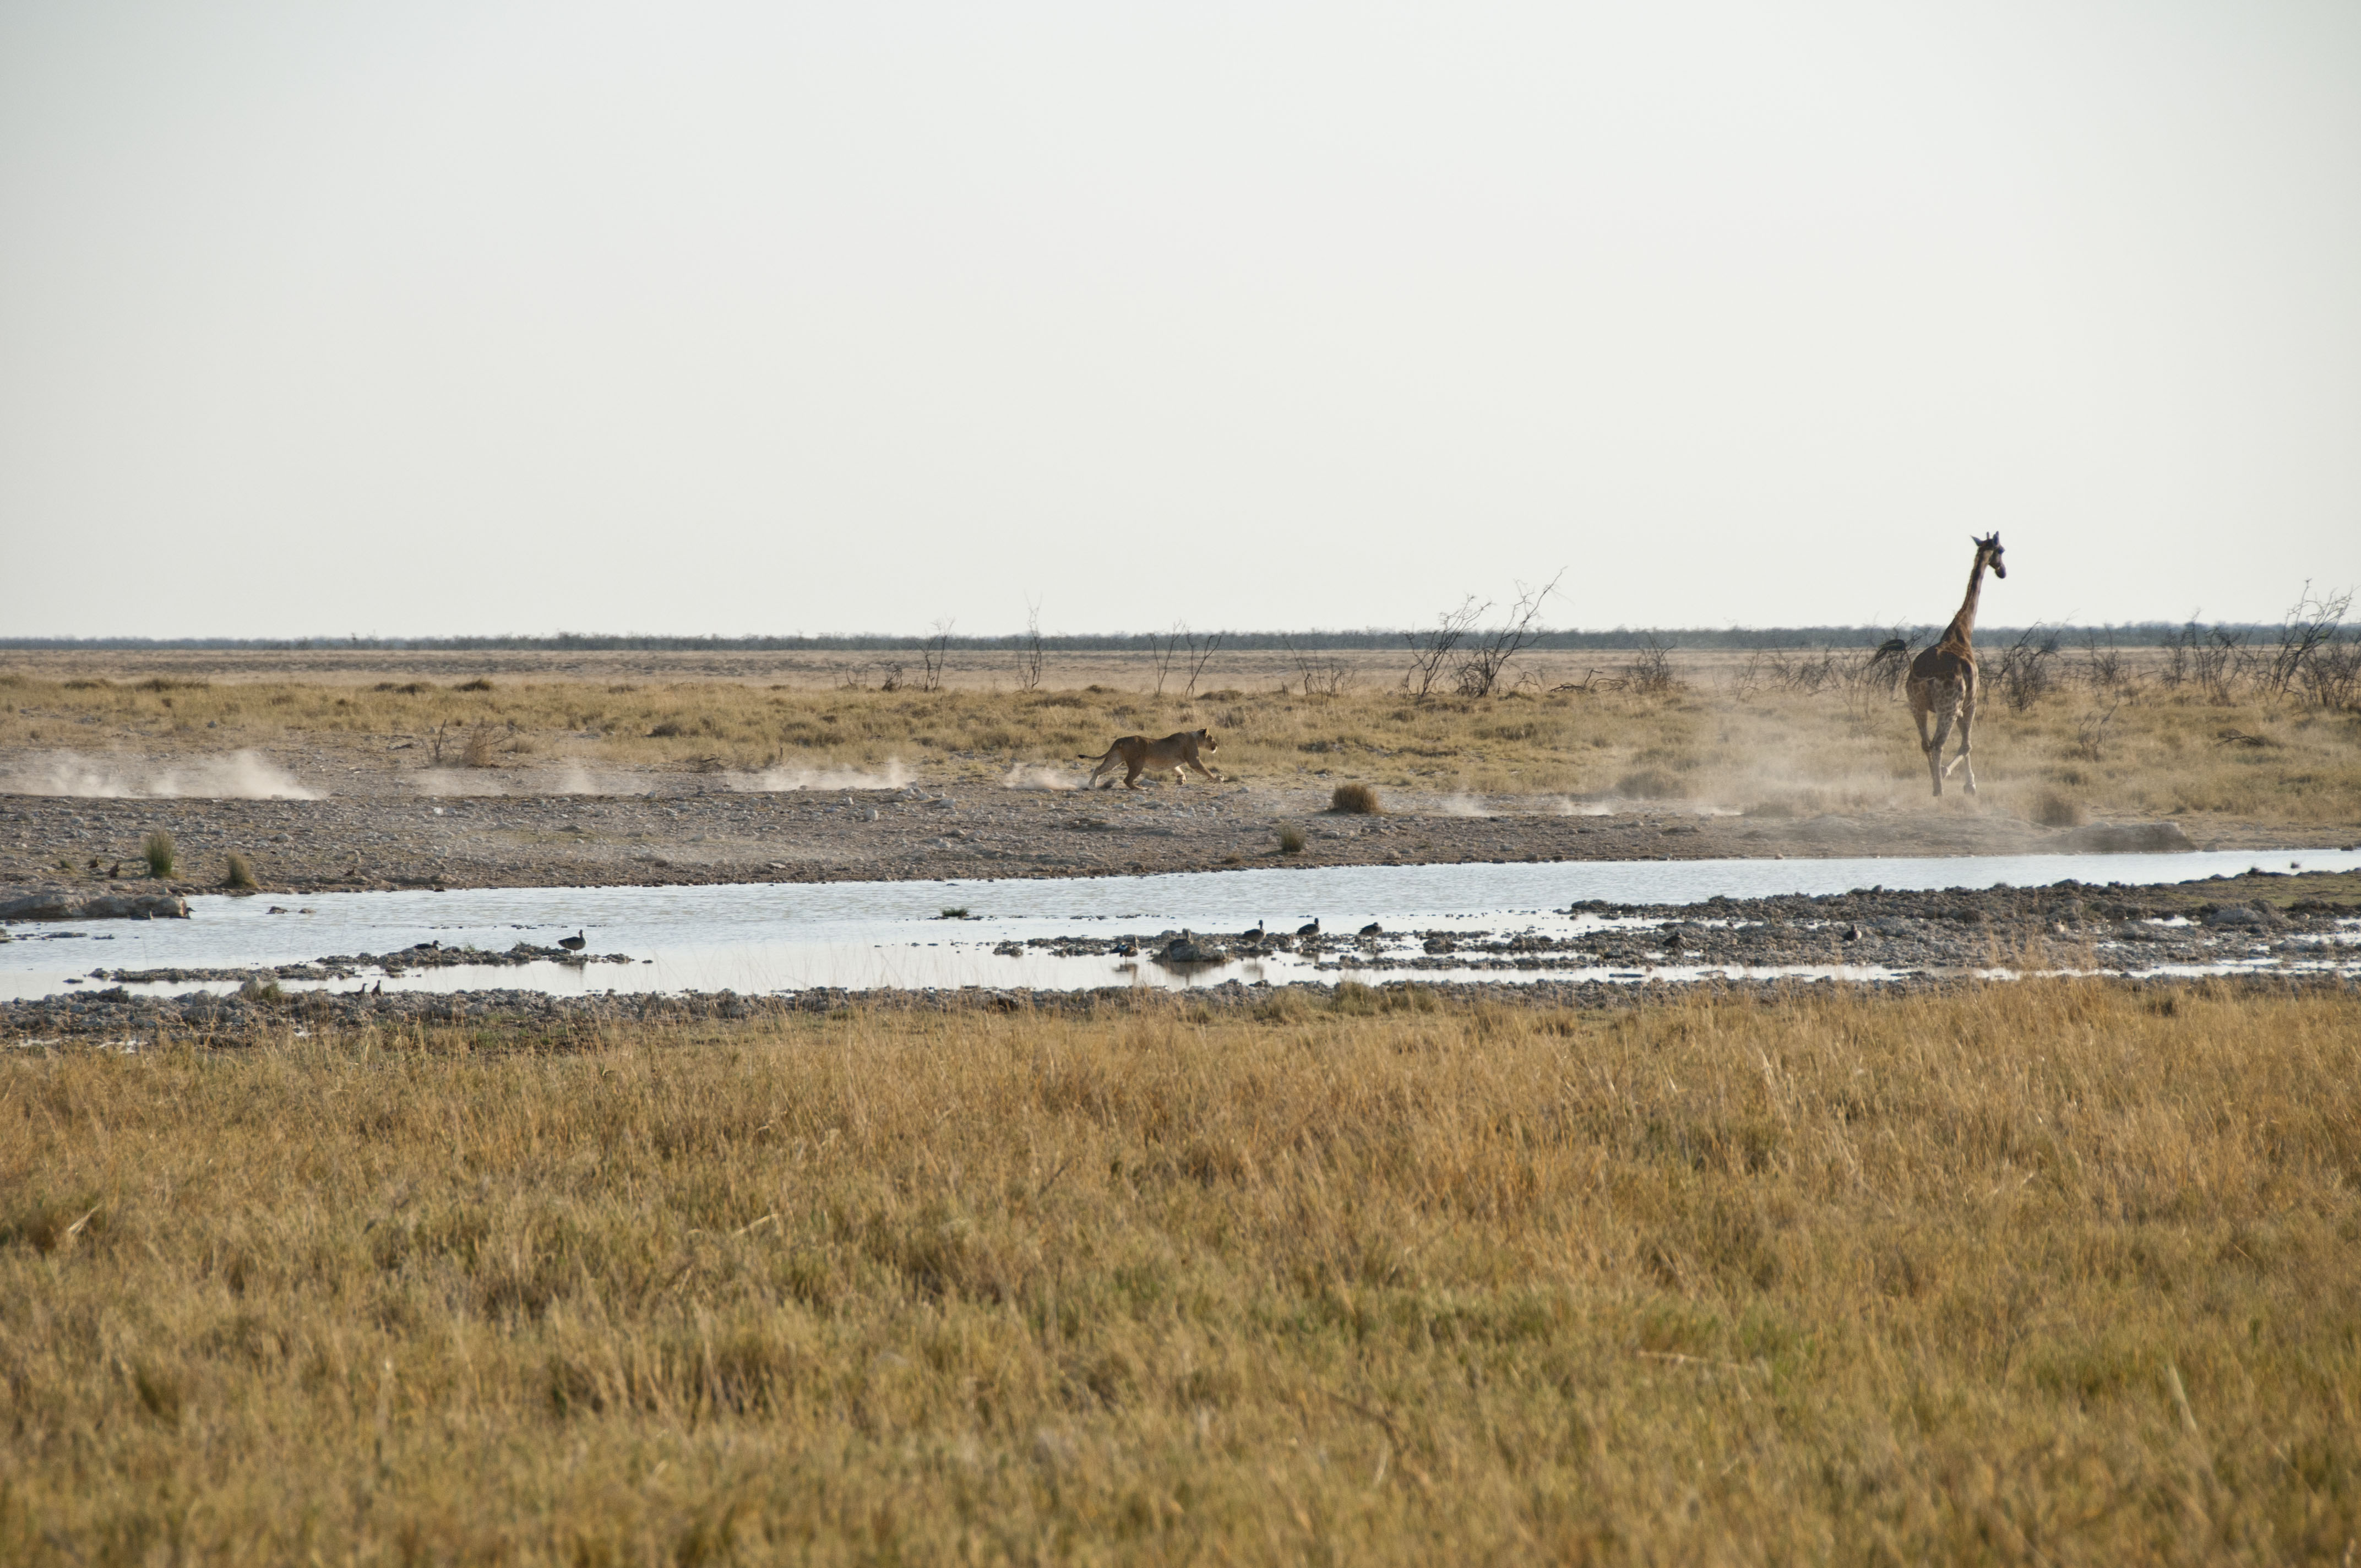 namibia_2014_kaokoveld-etoscha_119